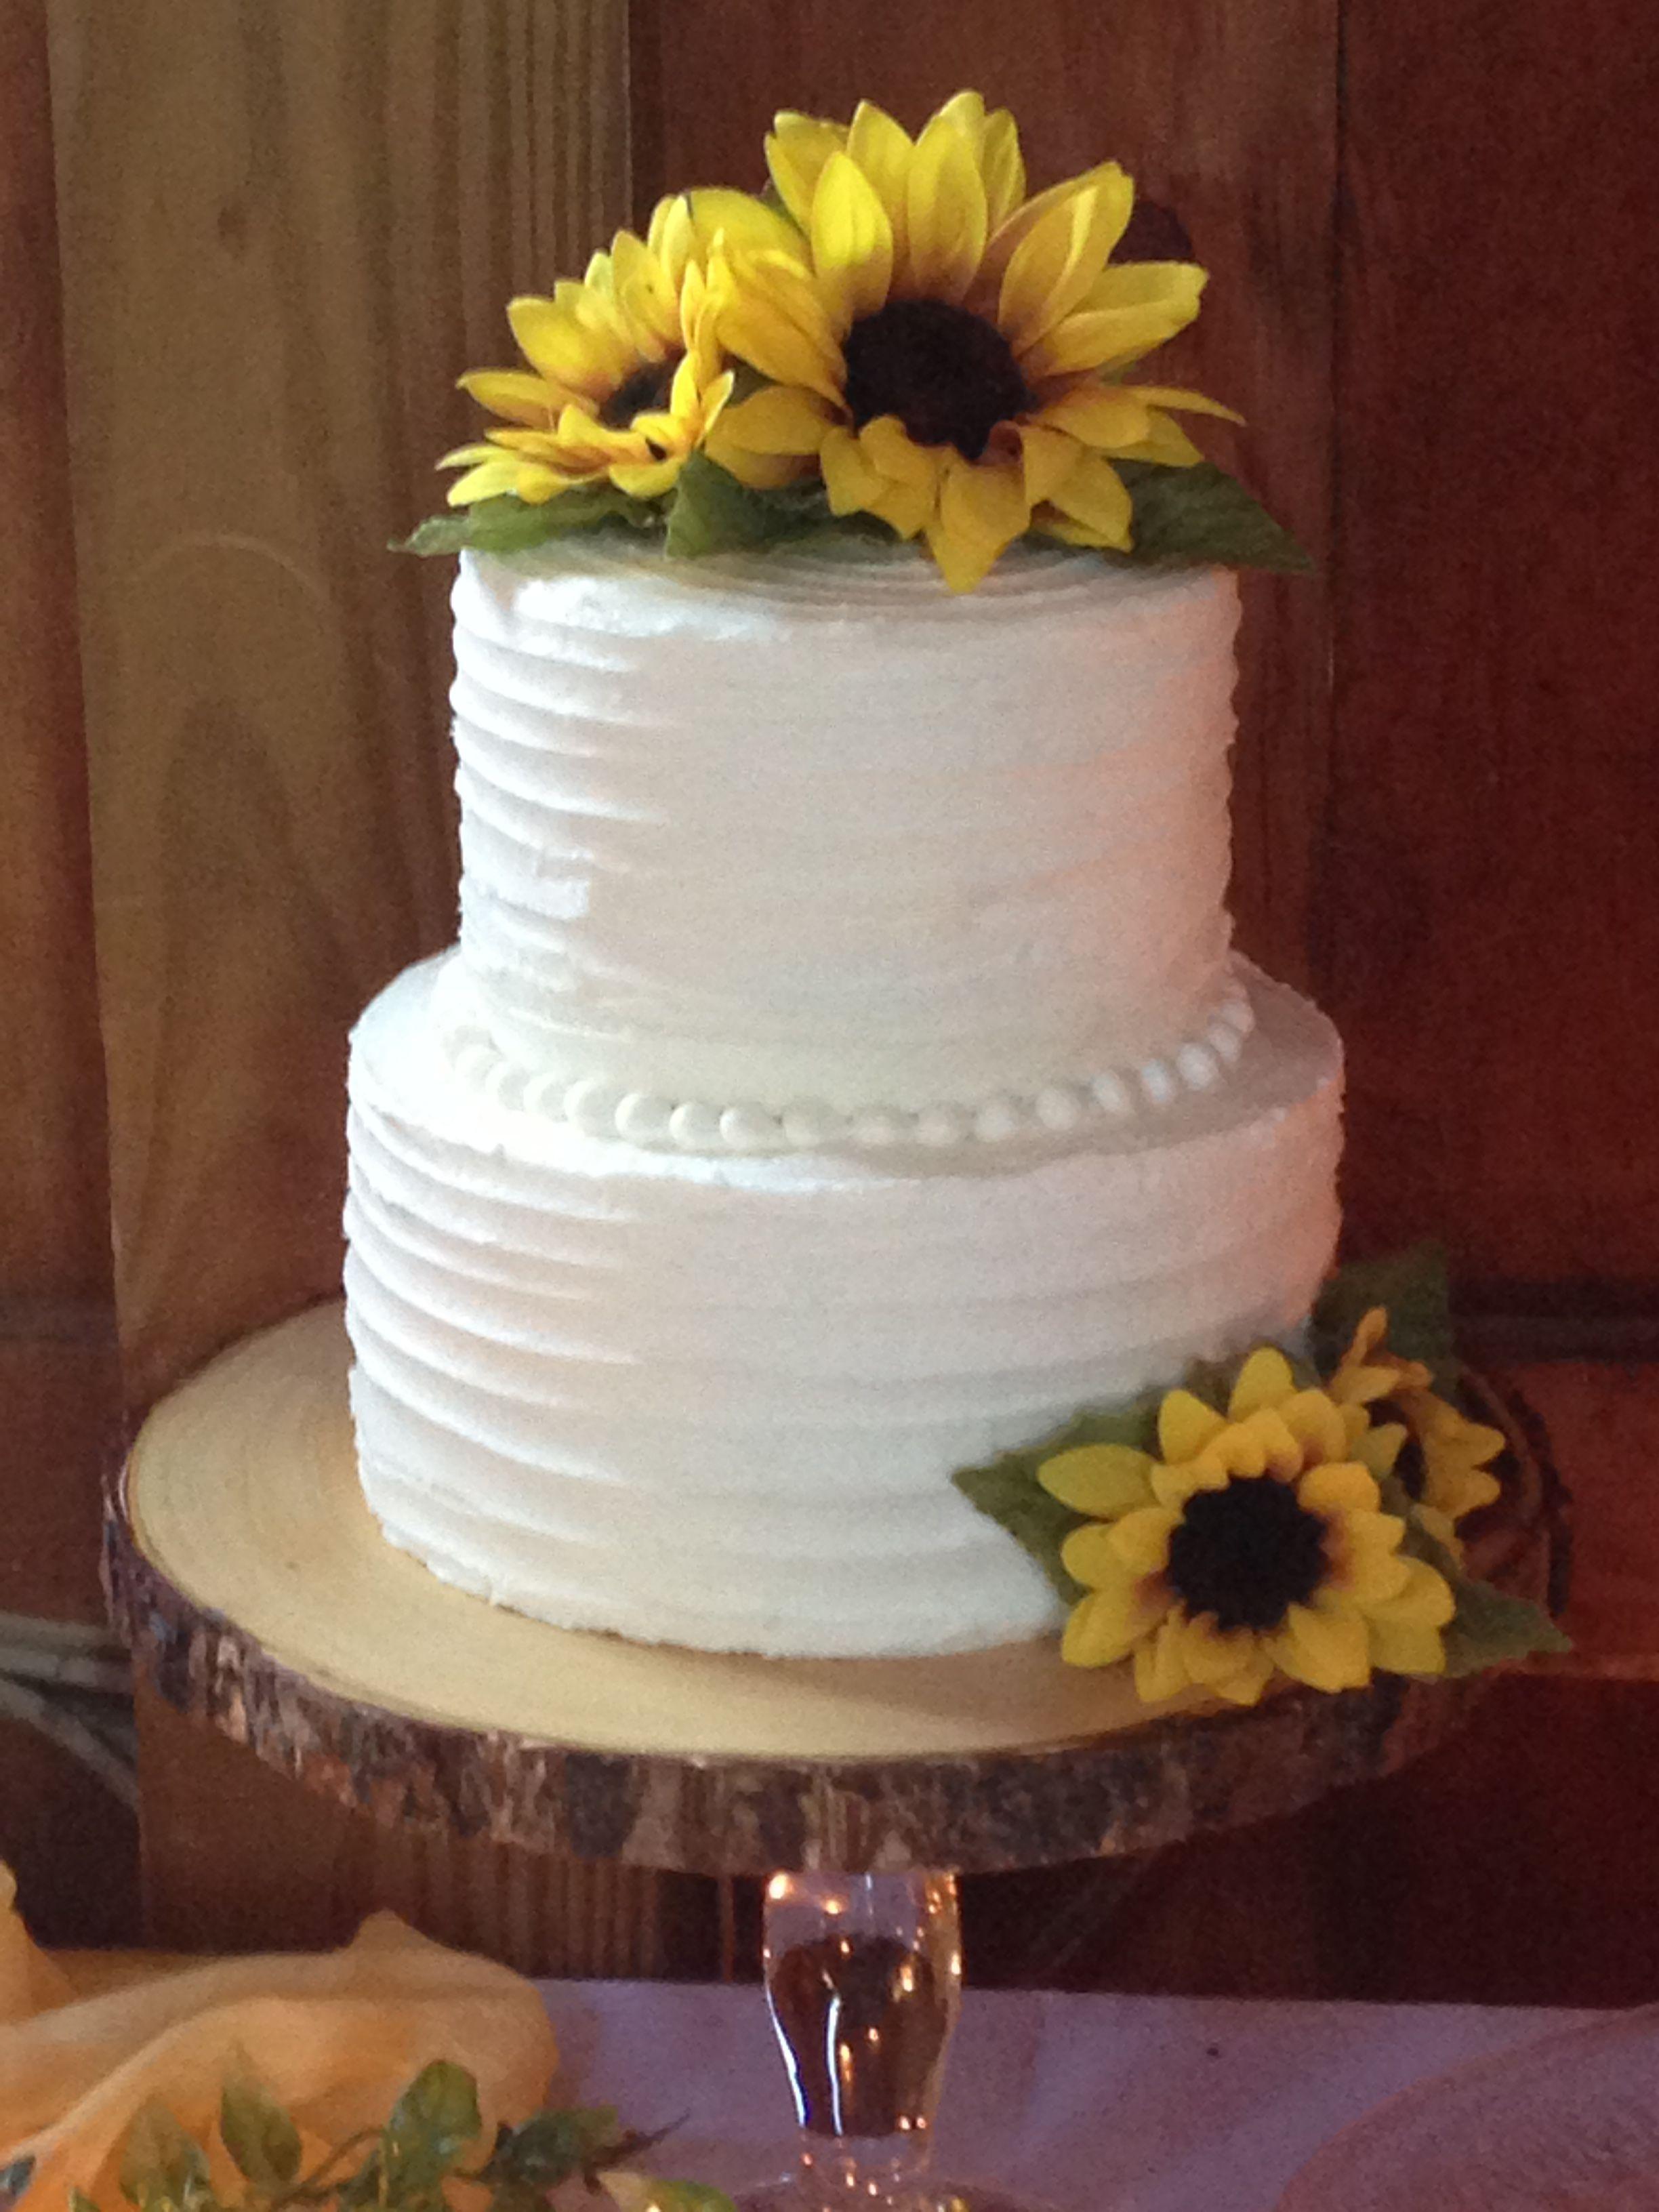 6 Amp 8 Chocolate Layer 2 Tier Wedding Cake Rustic Iced